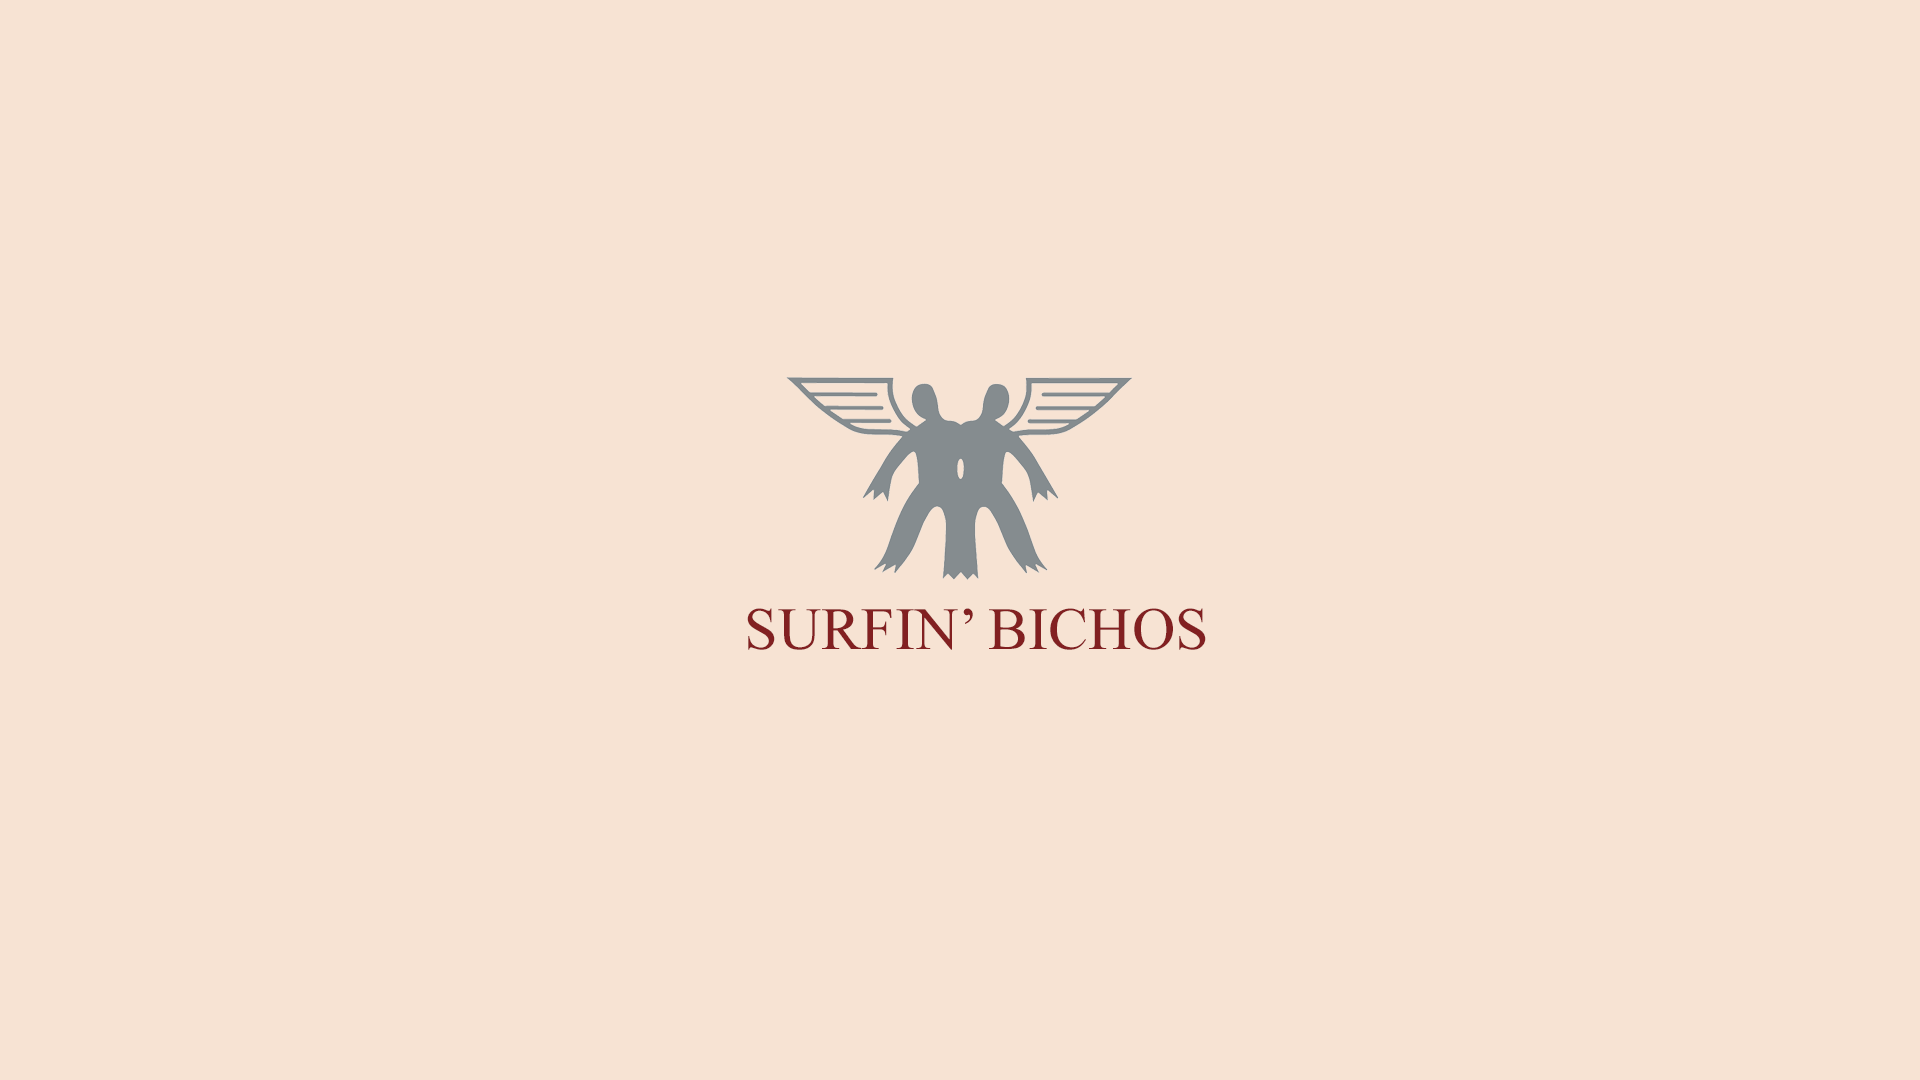 Surfin' Bichos, web hecha por murciègalo